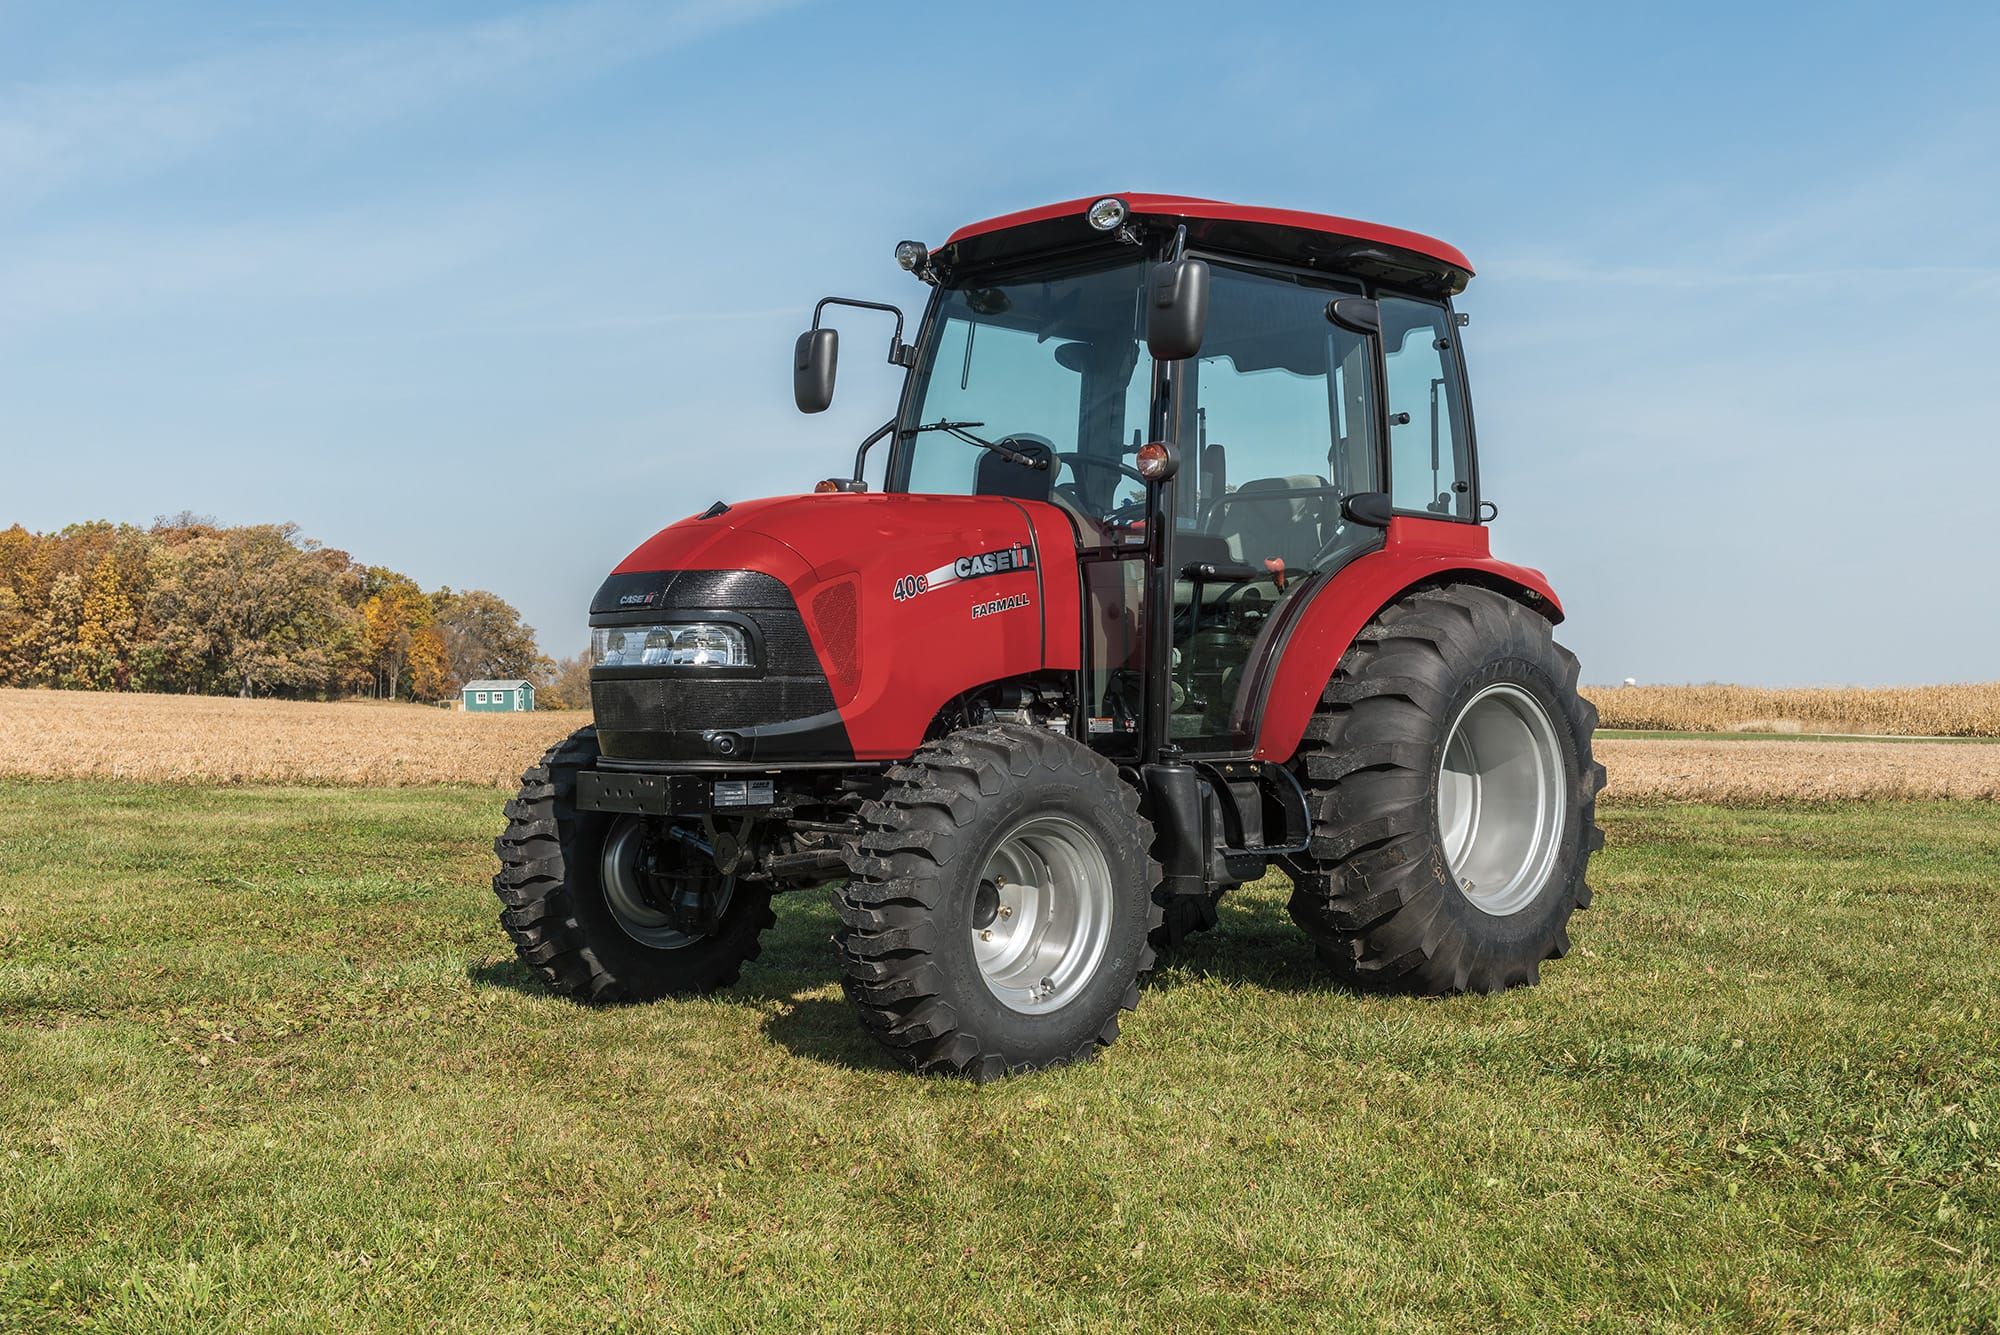 Compact Farmall 40c Utility Tractors Case Ih International Scout Ii Wiring Diagram